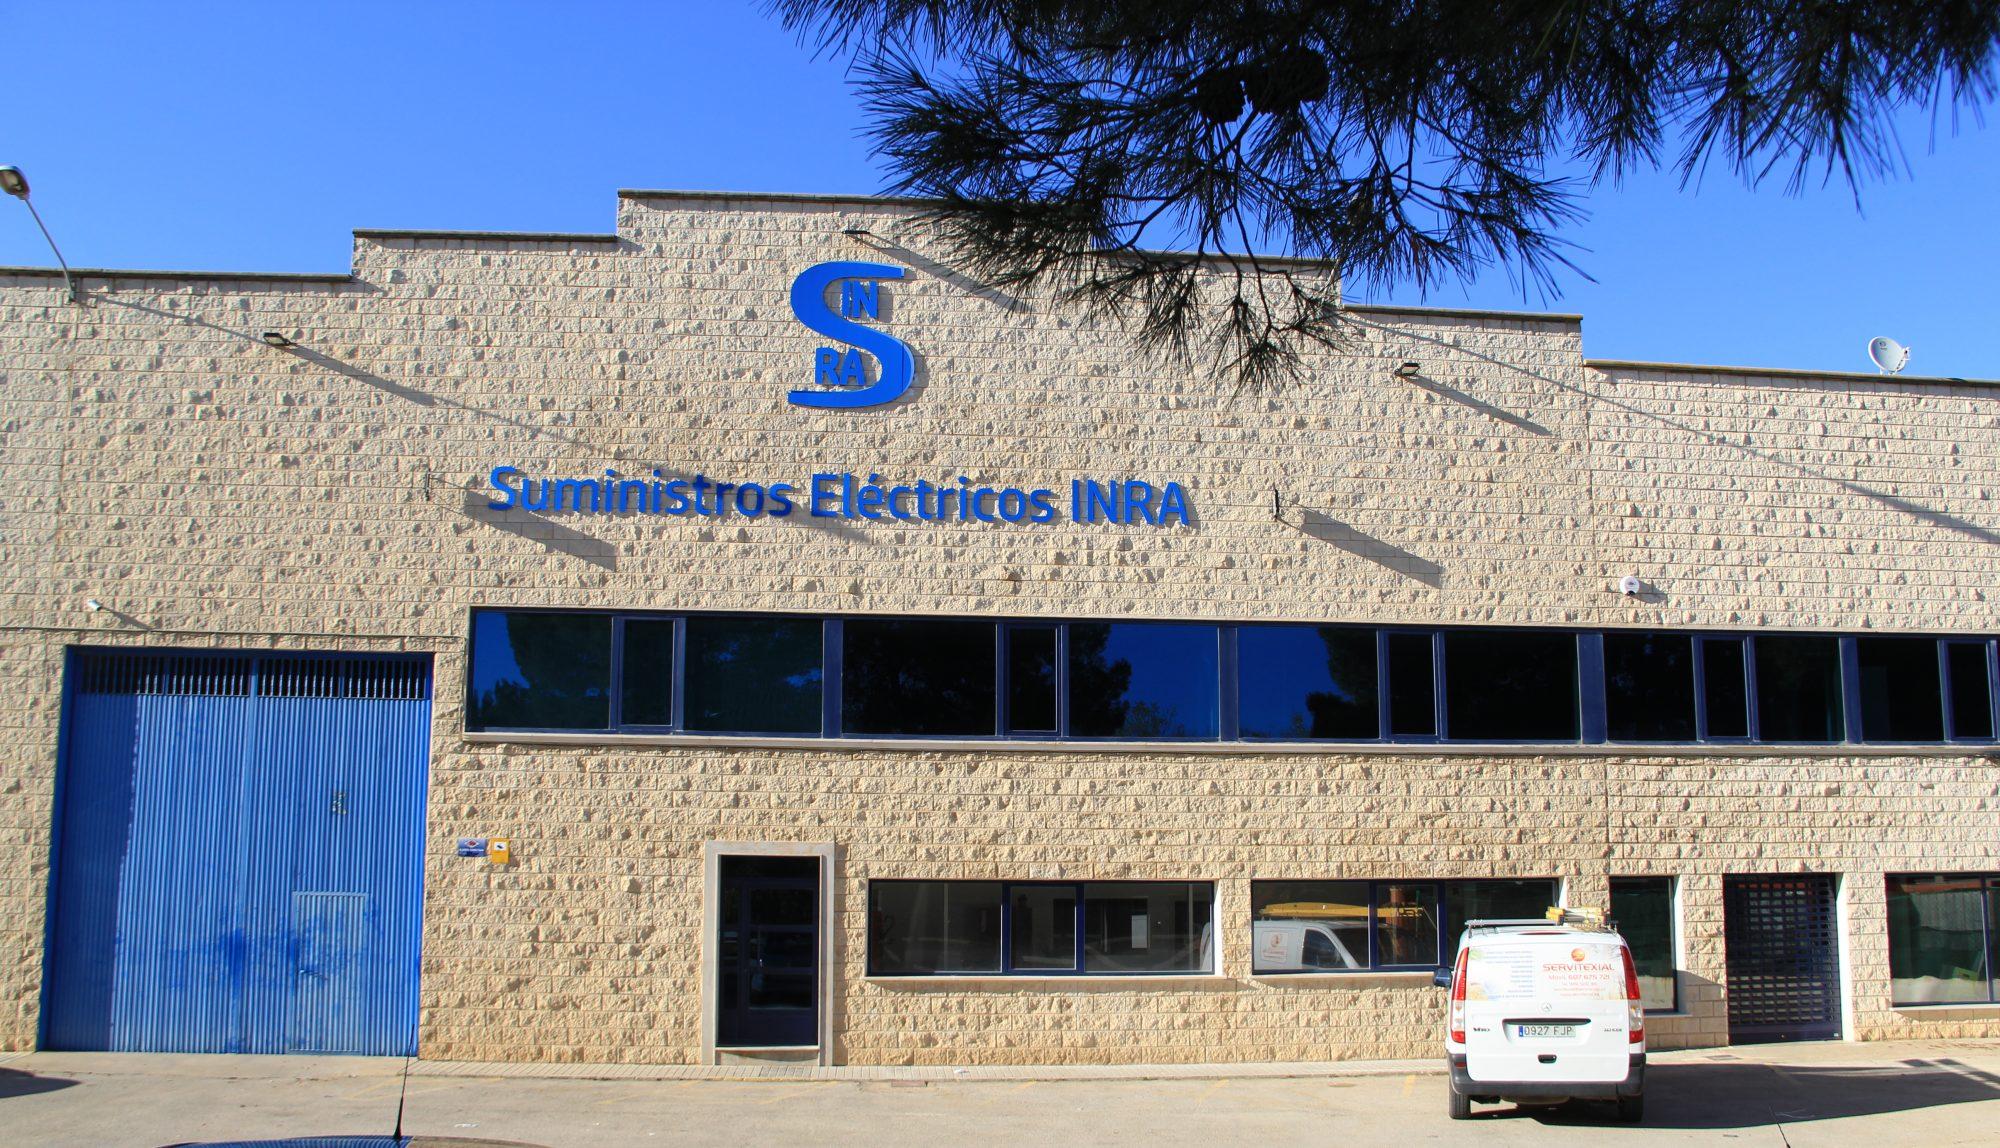 SUINRA - Suministros eléctricos Inra